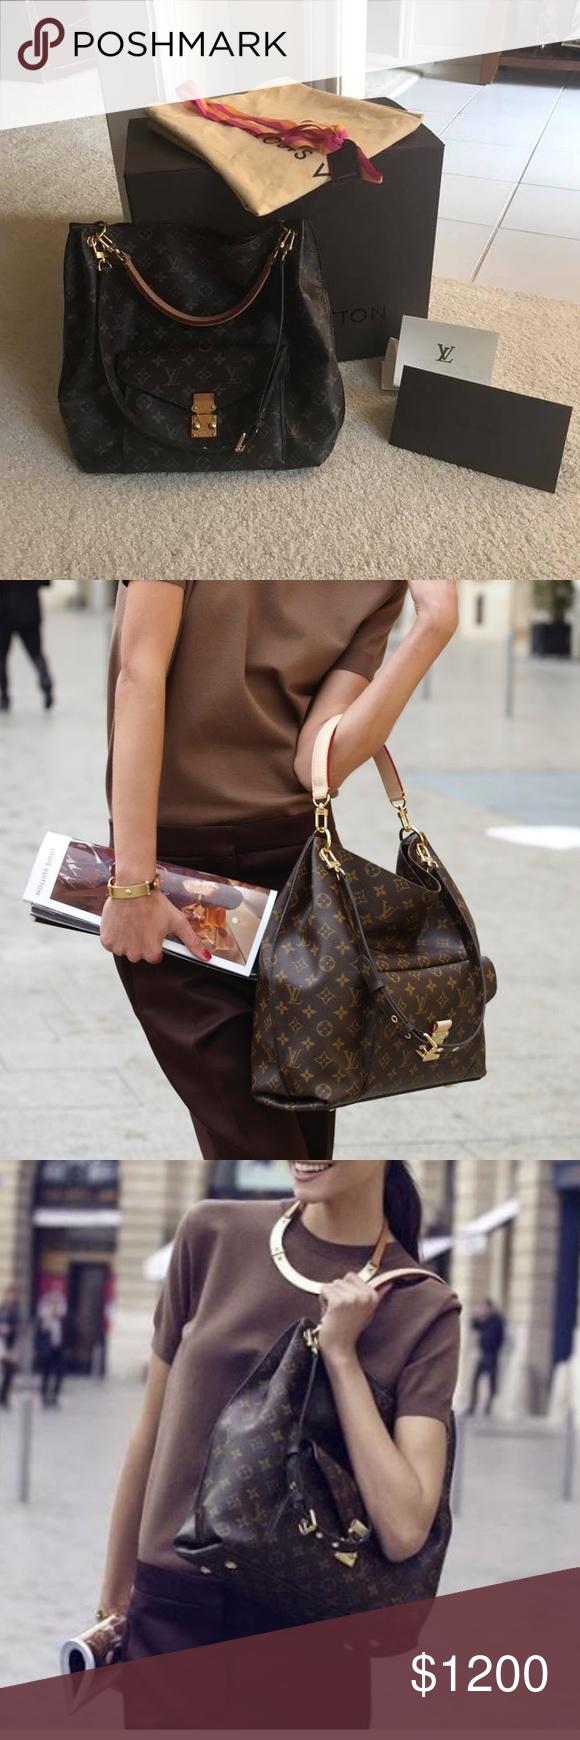 f74eea6887d7 Spotted while shopping on Poshmark  Louis Vuitton Metis Hobo!  poshmark   fashion  shopping  style  Louis Vuitton  Handbags